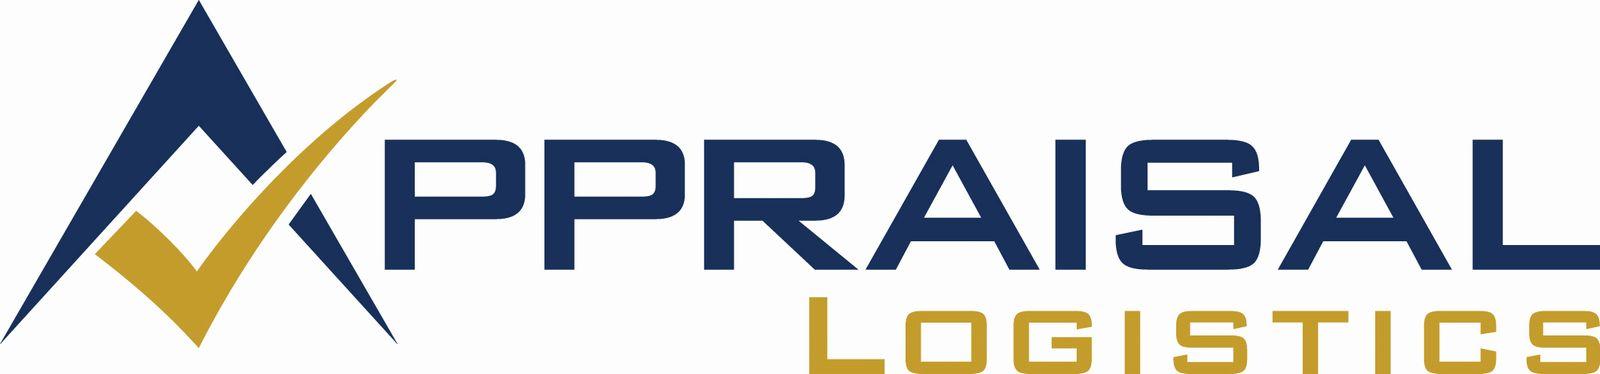 Appraisal Logistics logo